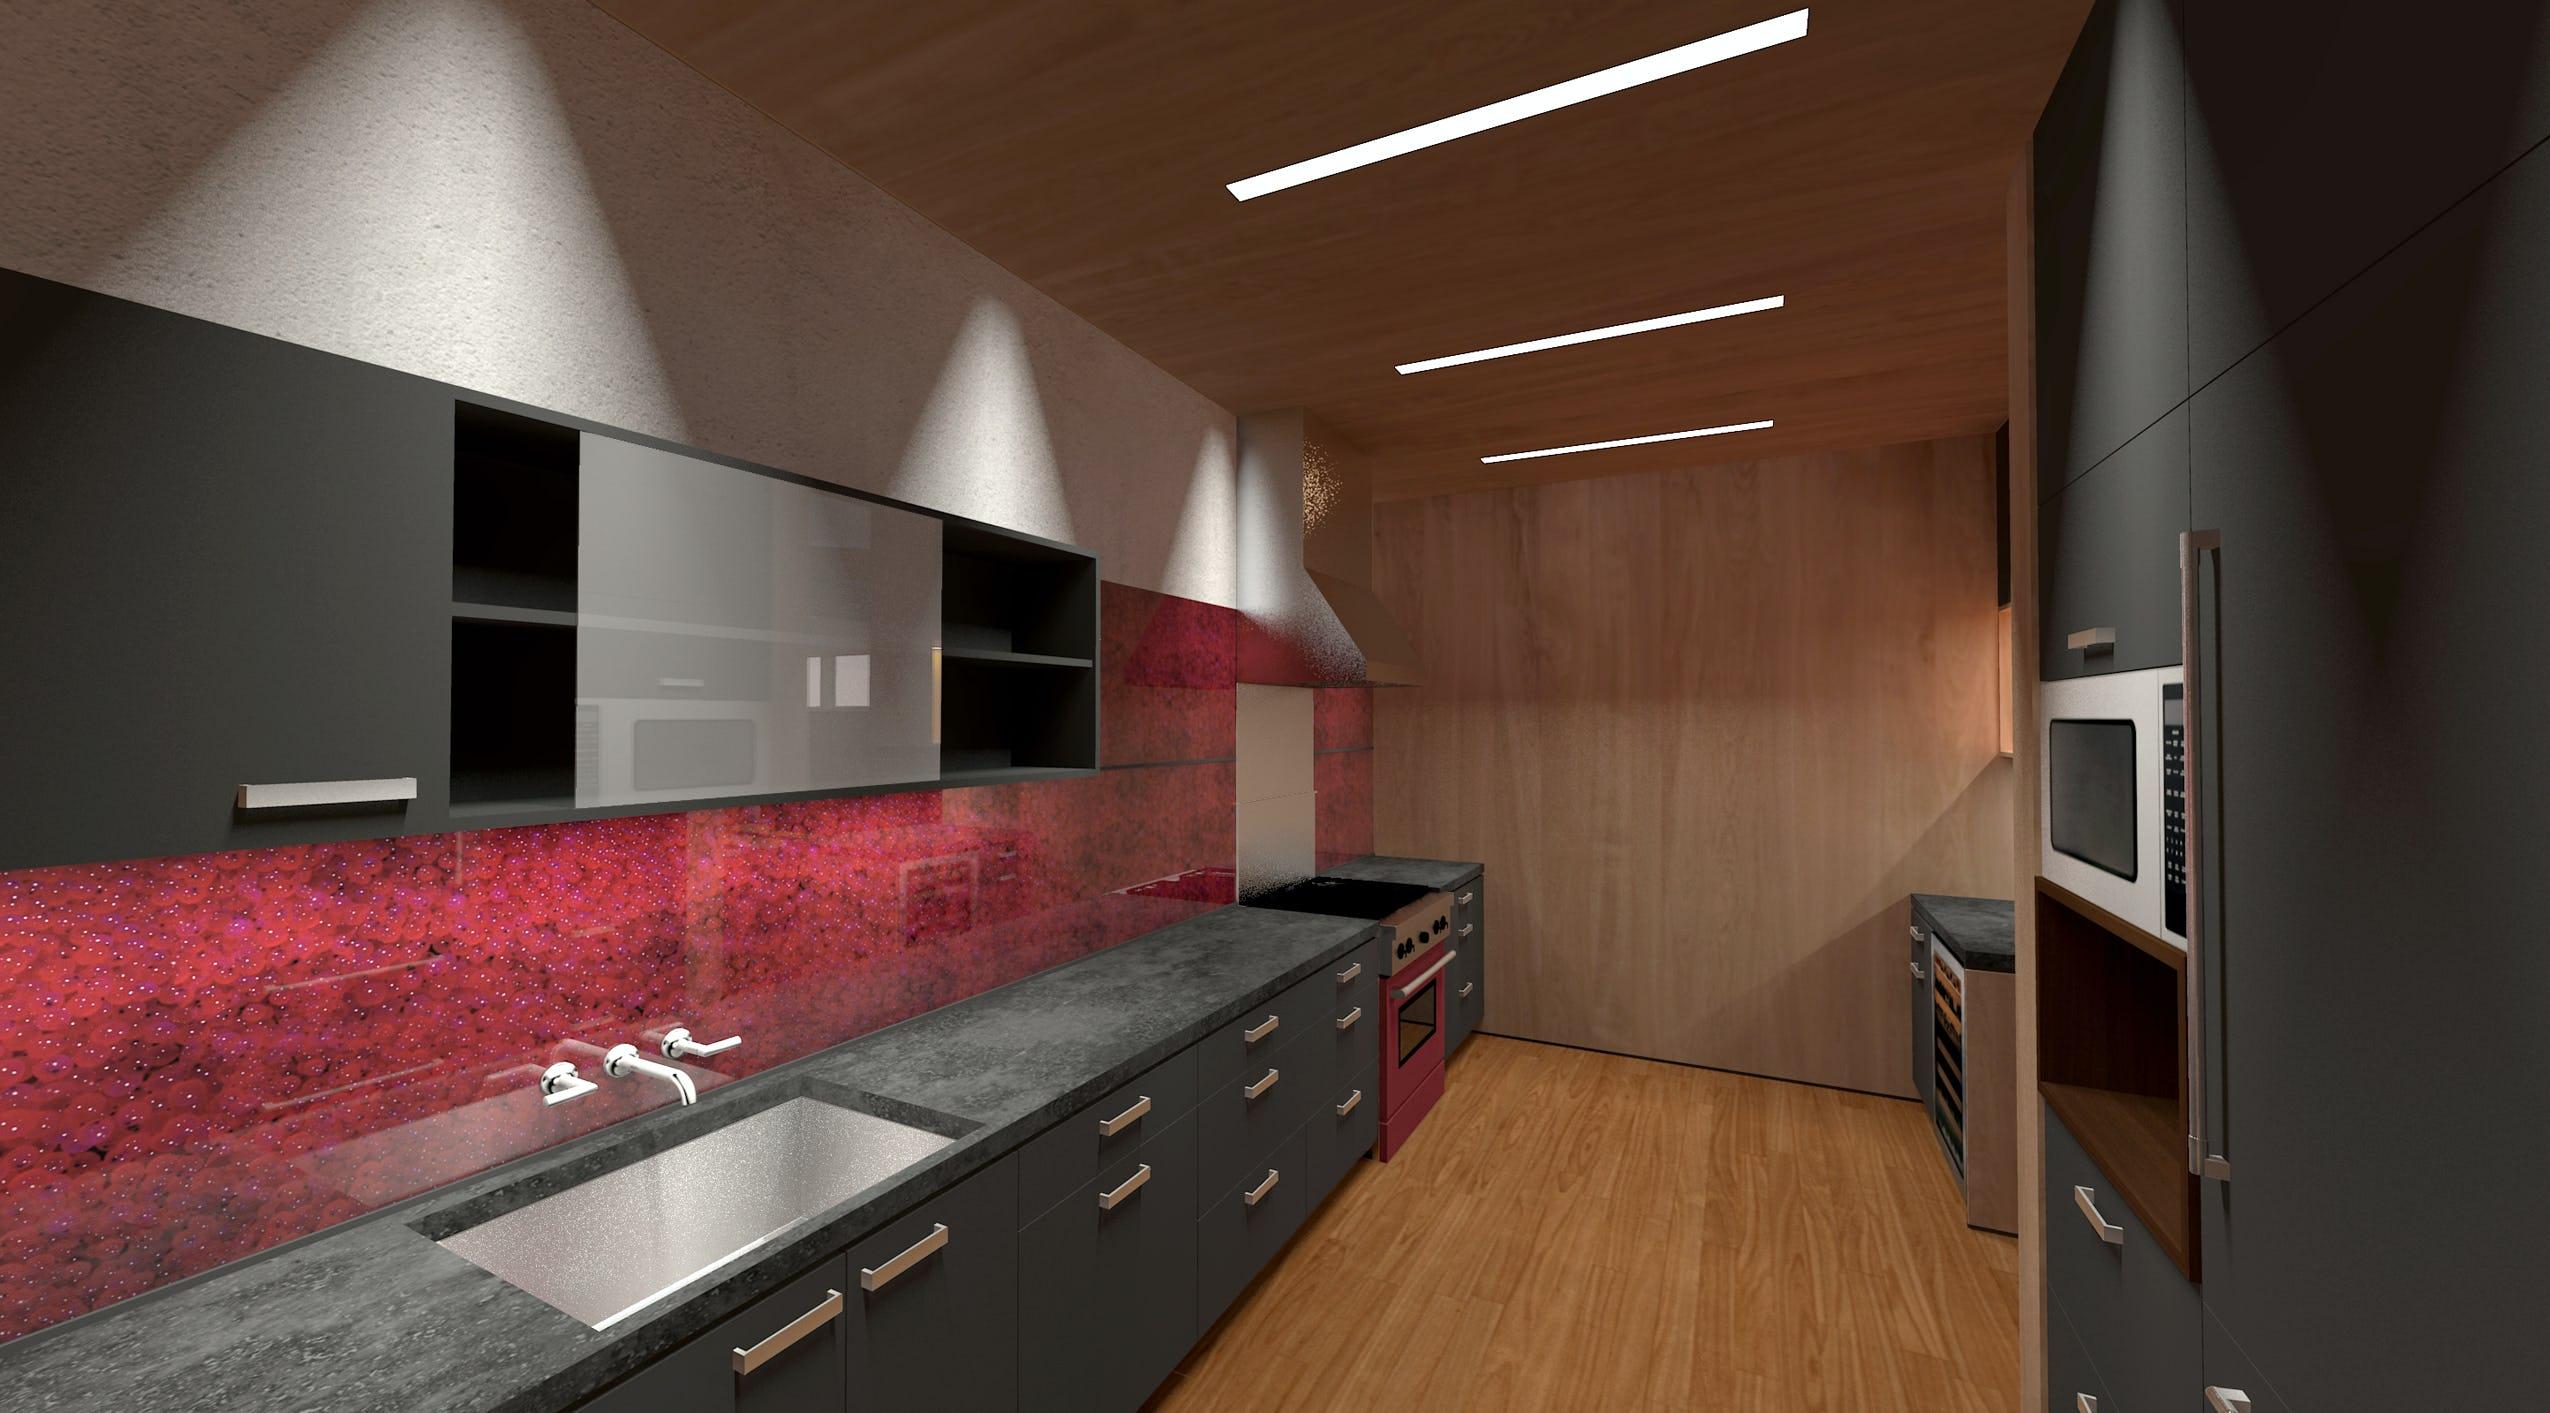 Kitchen north perspective